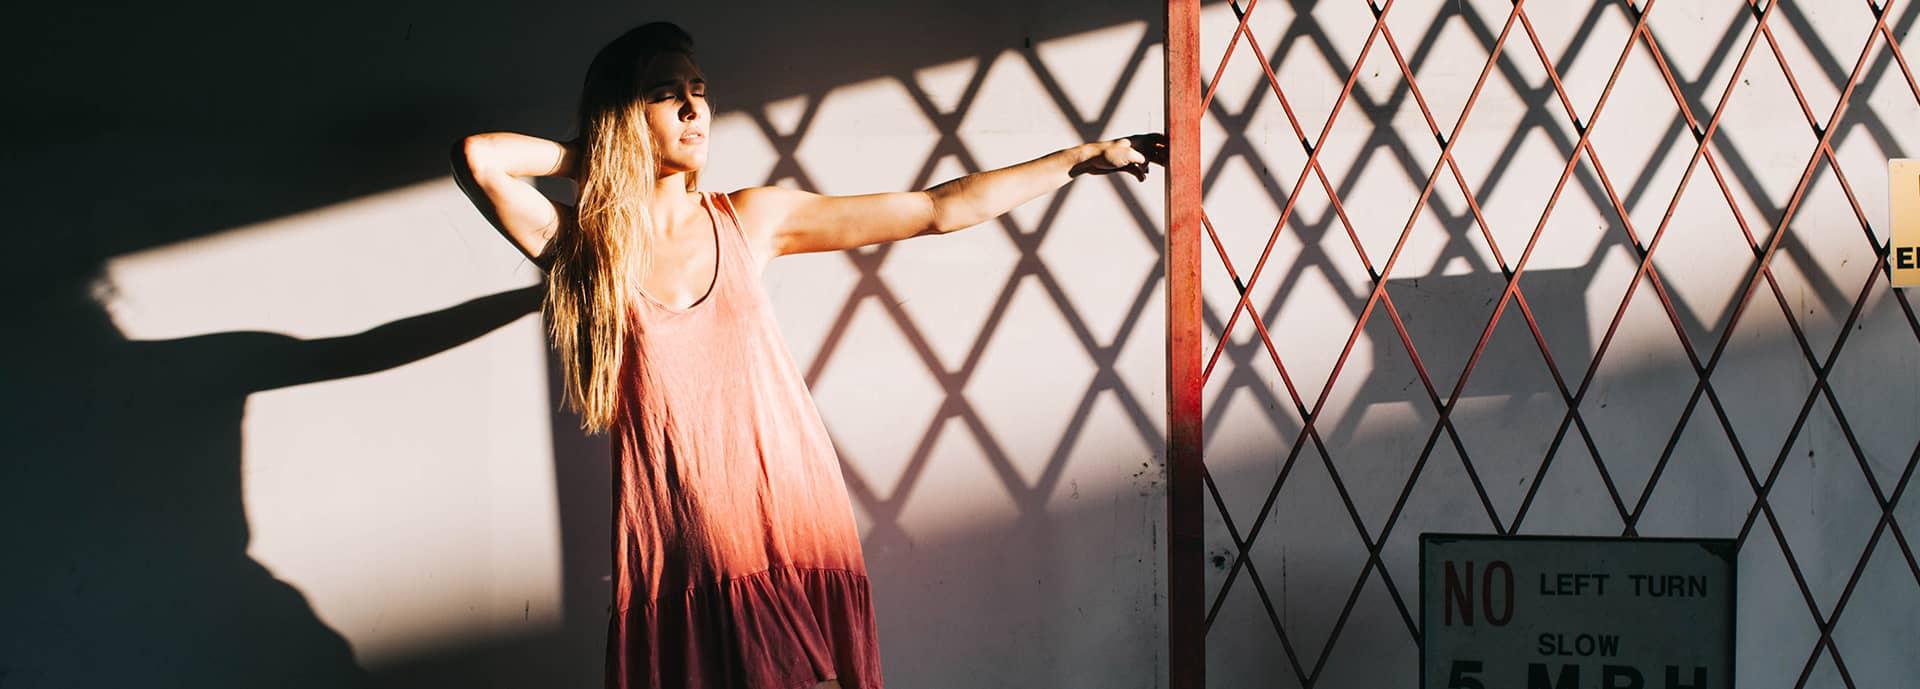 Gesa Cowell Photography